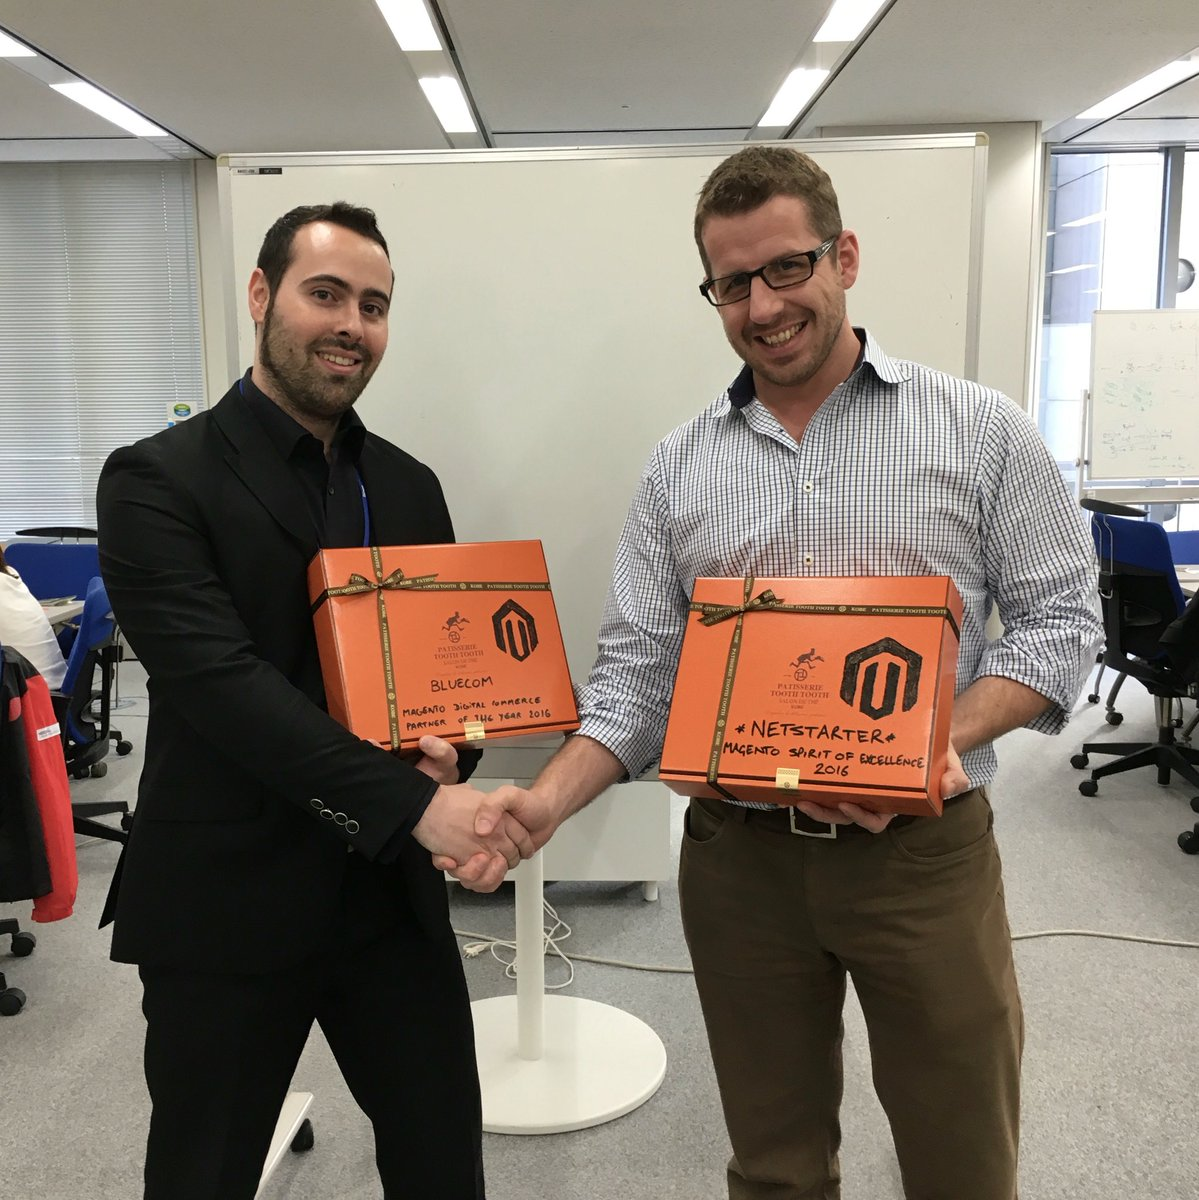 benpopps: Meanwhile in Japan @Netstarter & @BluecomGroup working together and pleased with respective #magentoimagine awards https://t.co/JofiBSinXk